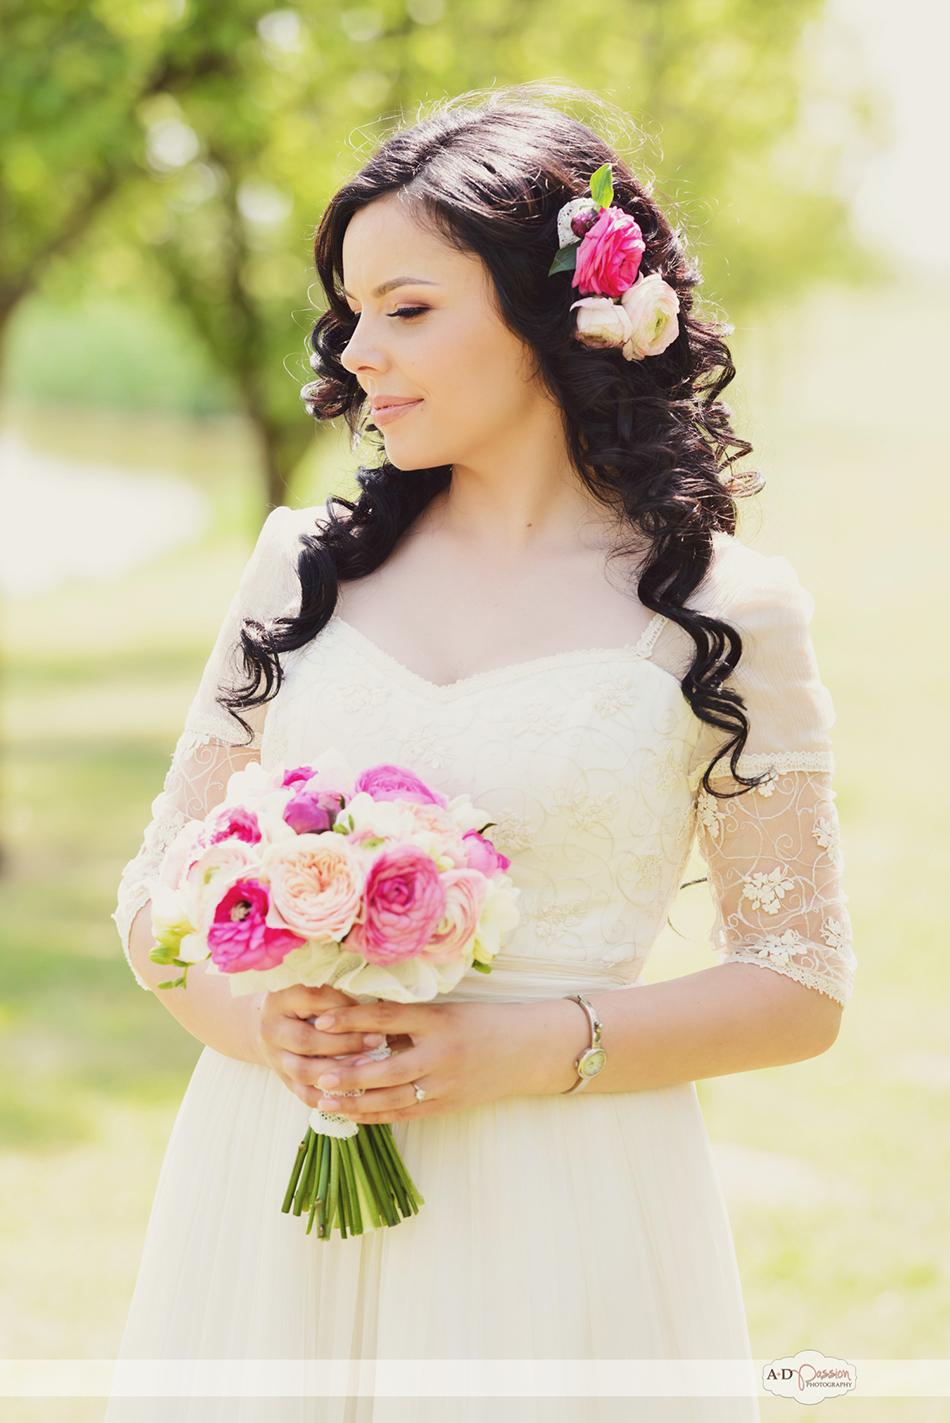 AD Passion Photography | 20140428_fotograf-nunta-timisoara_cristina_si_emanuel_0045 | Adelin, Dida, fotograf profesionist, fotograf de nunta, fotografie de nunta, fotograf Timisoara, fotograf Craiova, fotograf Bucuresti, fotograf Arad, nunta Timisoara, nunta Arad, nunta Bucuresti, nunta Craiova